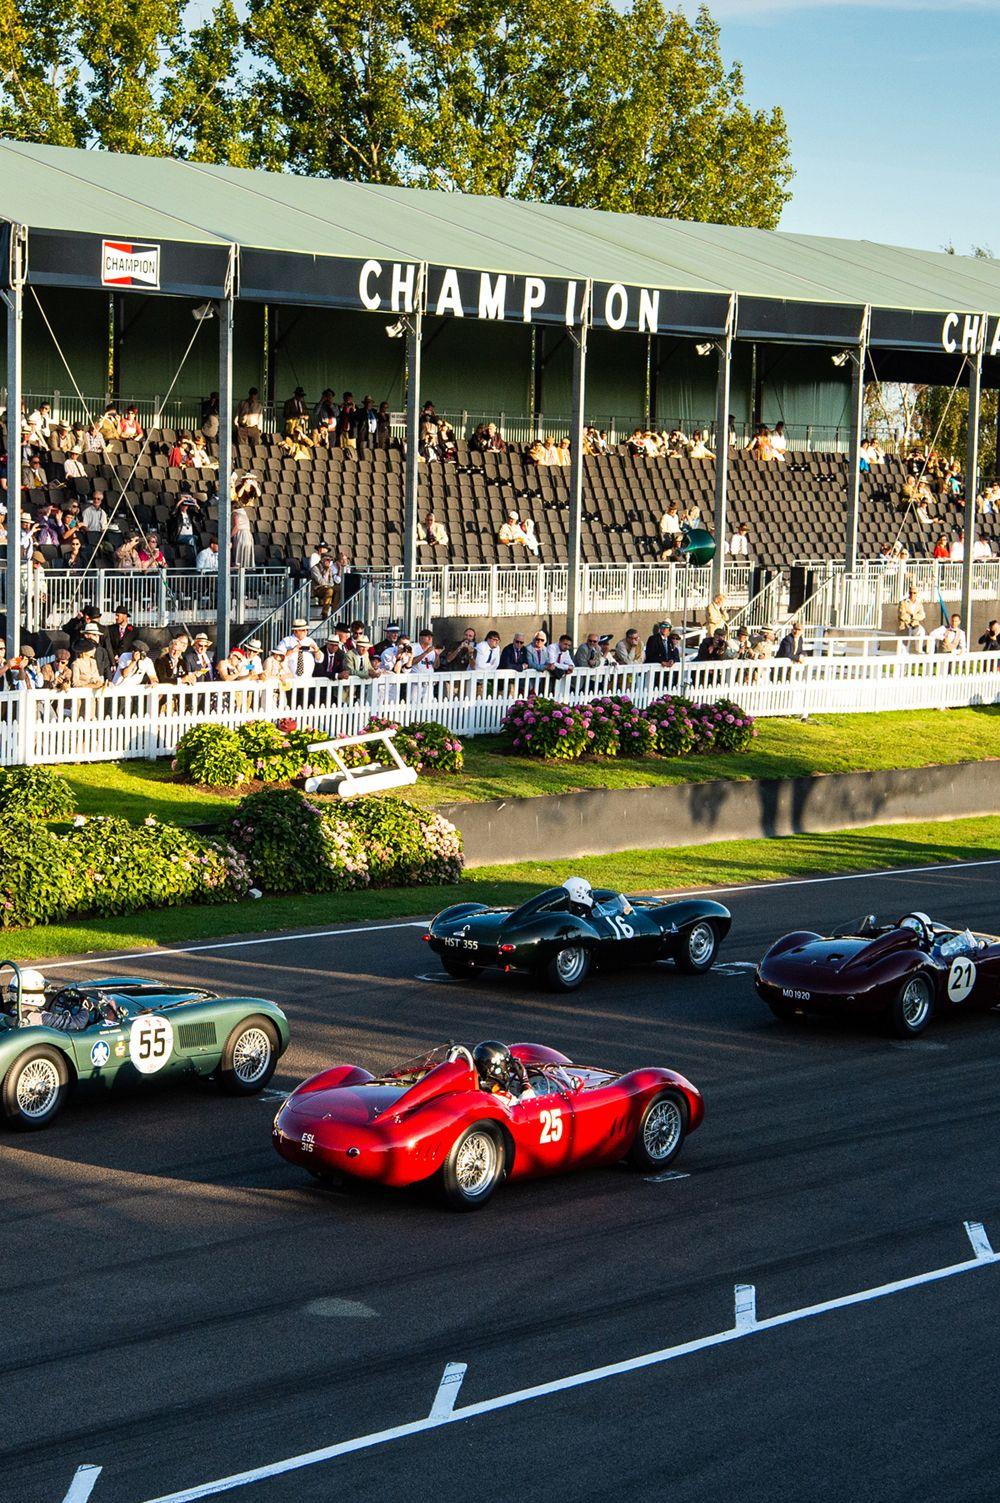 Maserati at Goodwood Revival - Freddie March Memorial Trophy_1_edited-1